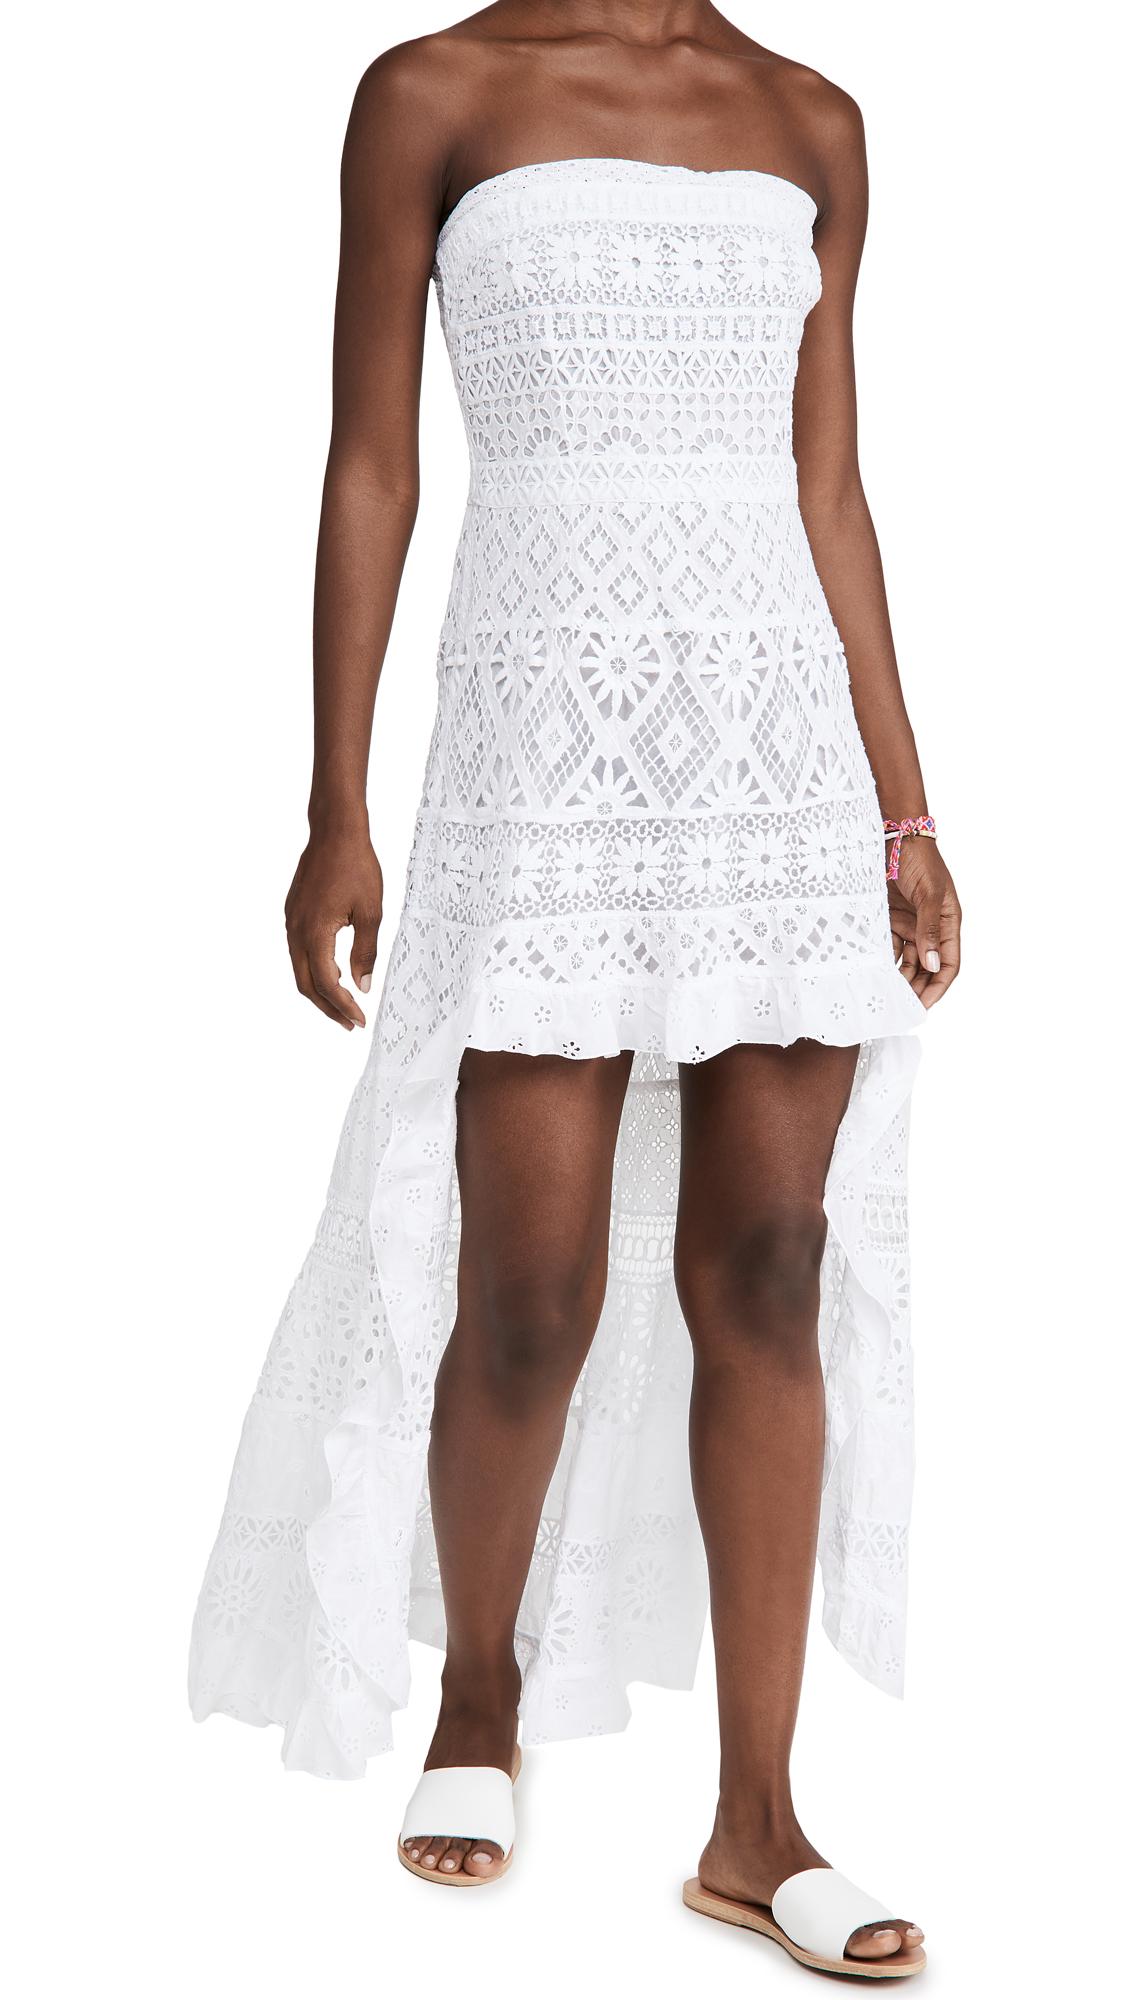 Temptation Positano Cuzco Dress